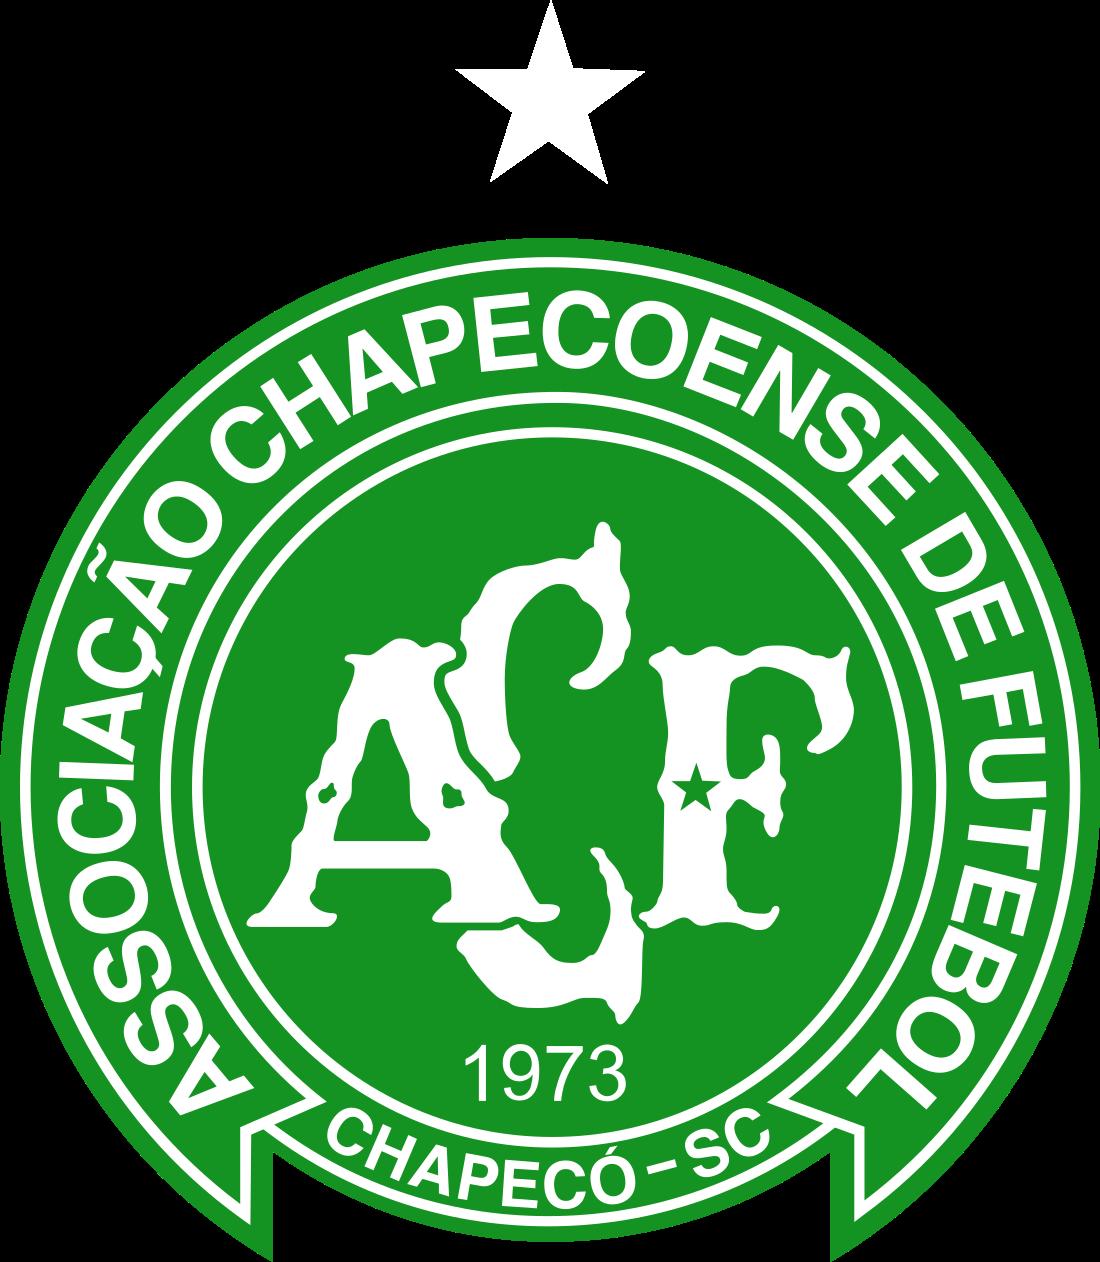 chapecoense-logo-escudo-shield-7